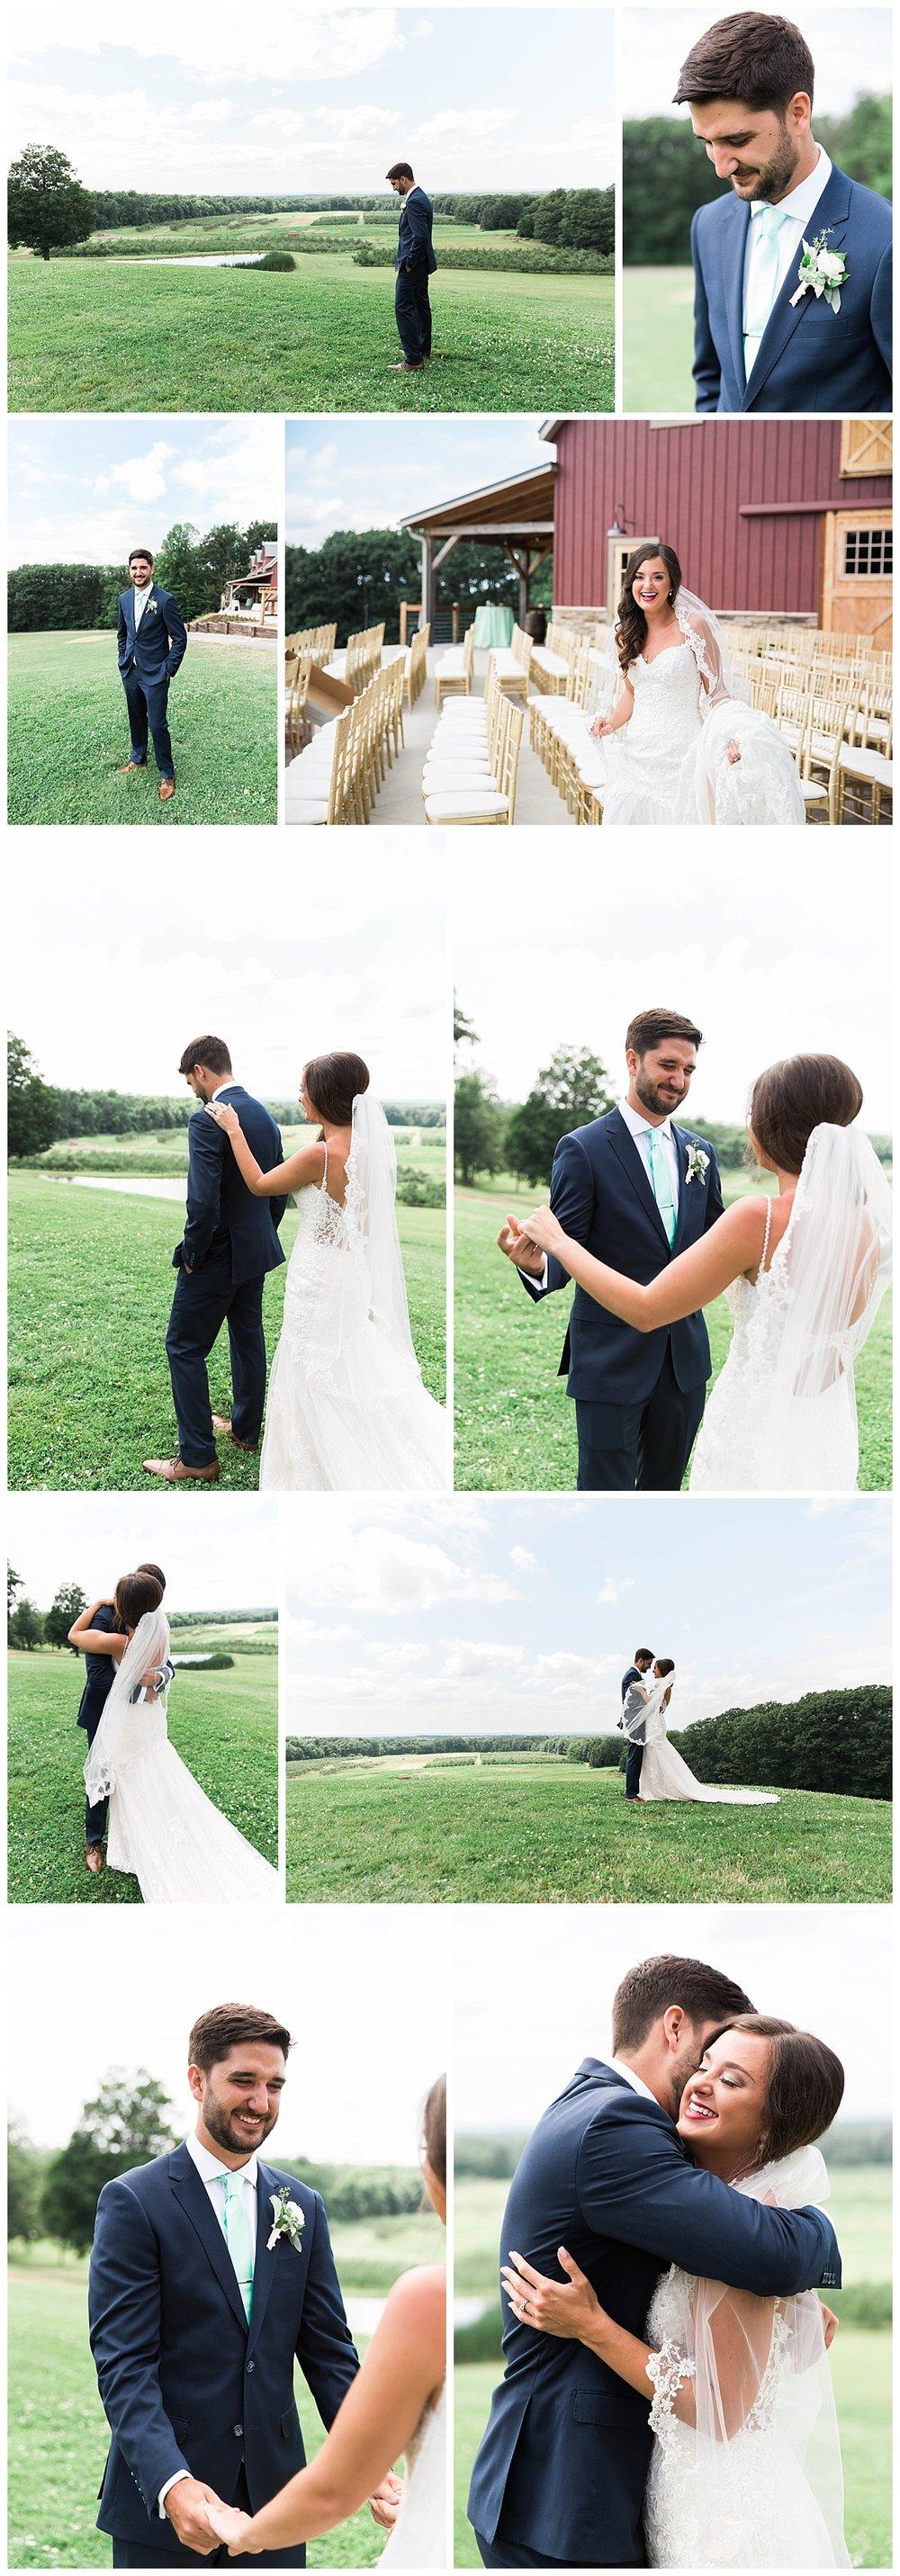 Cleveland-Wedding-Photographer_0058.jpg